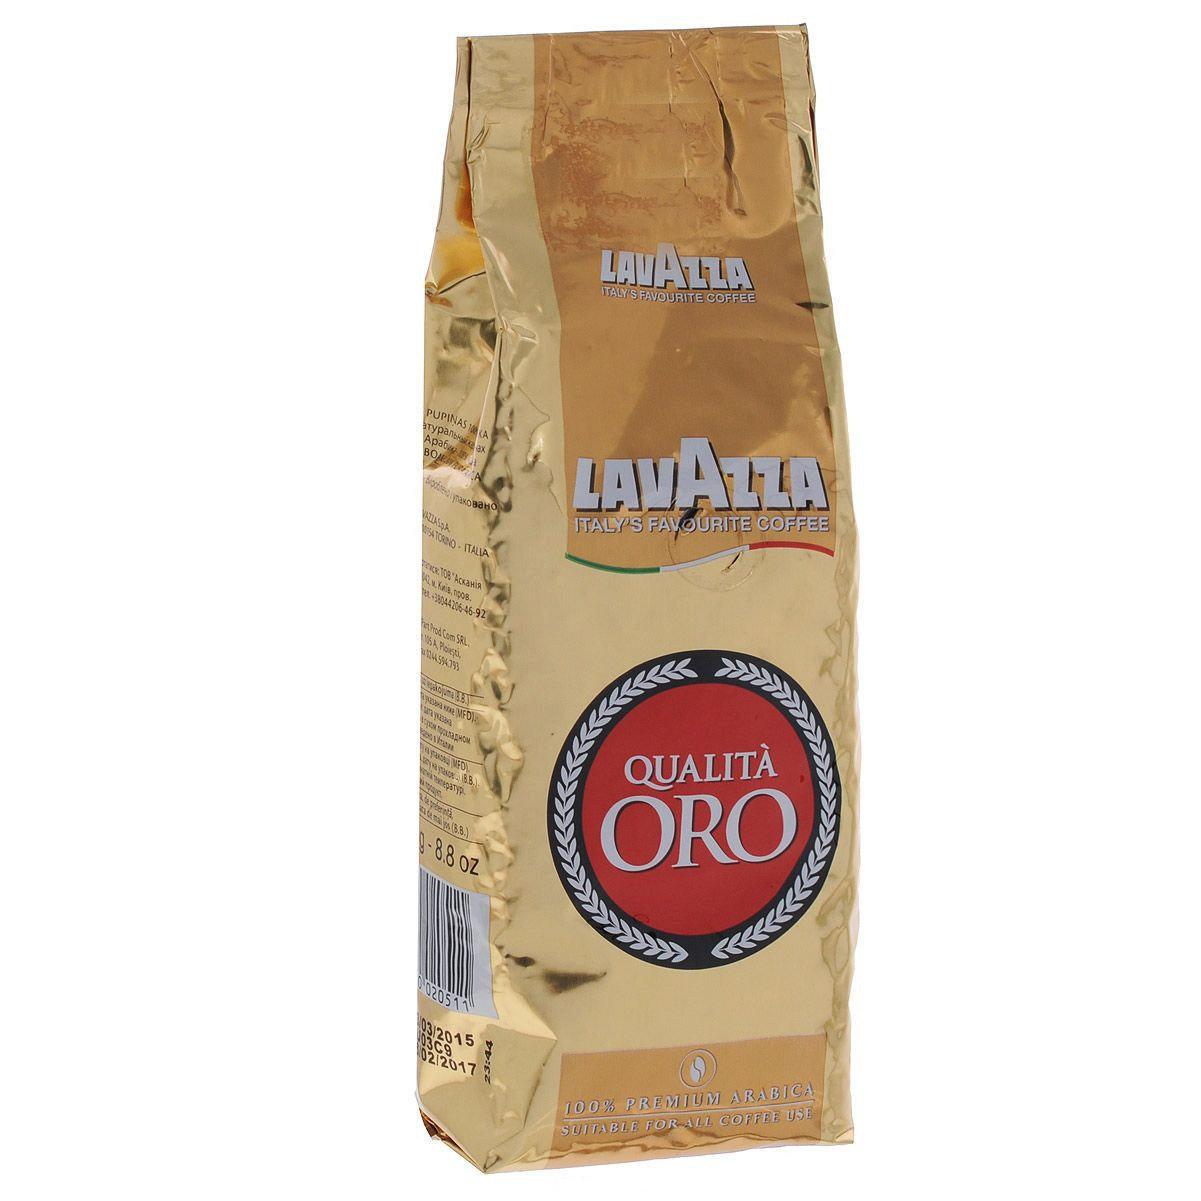 Кофе в зернах Lavazza Qualita Oro 250 г кофе в зернах lavazza qualita rossa 1 кг